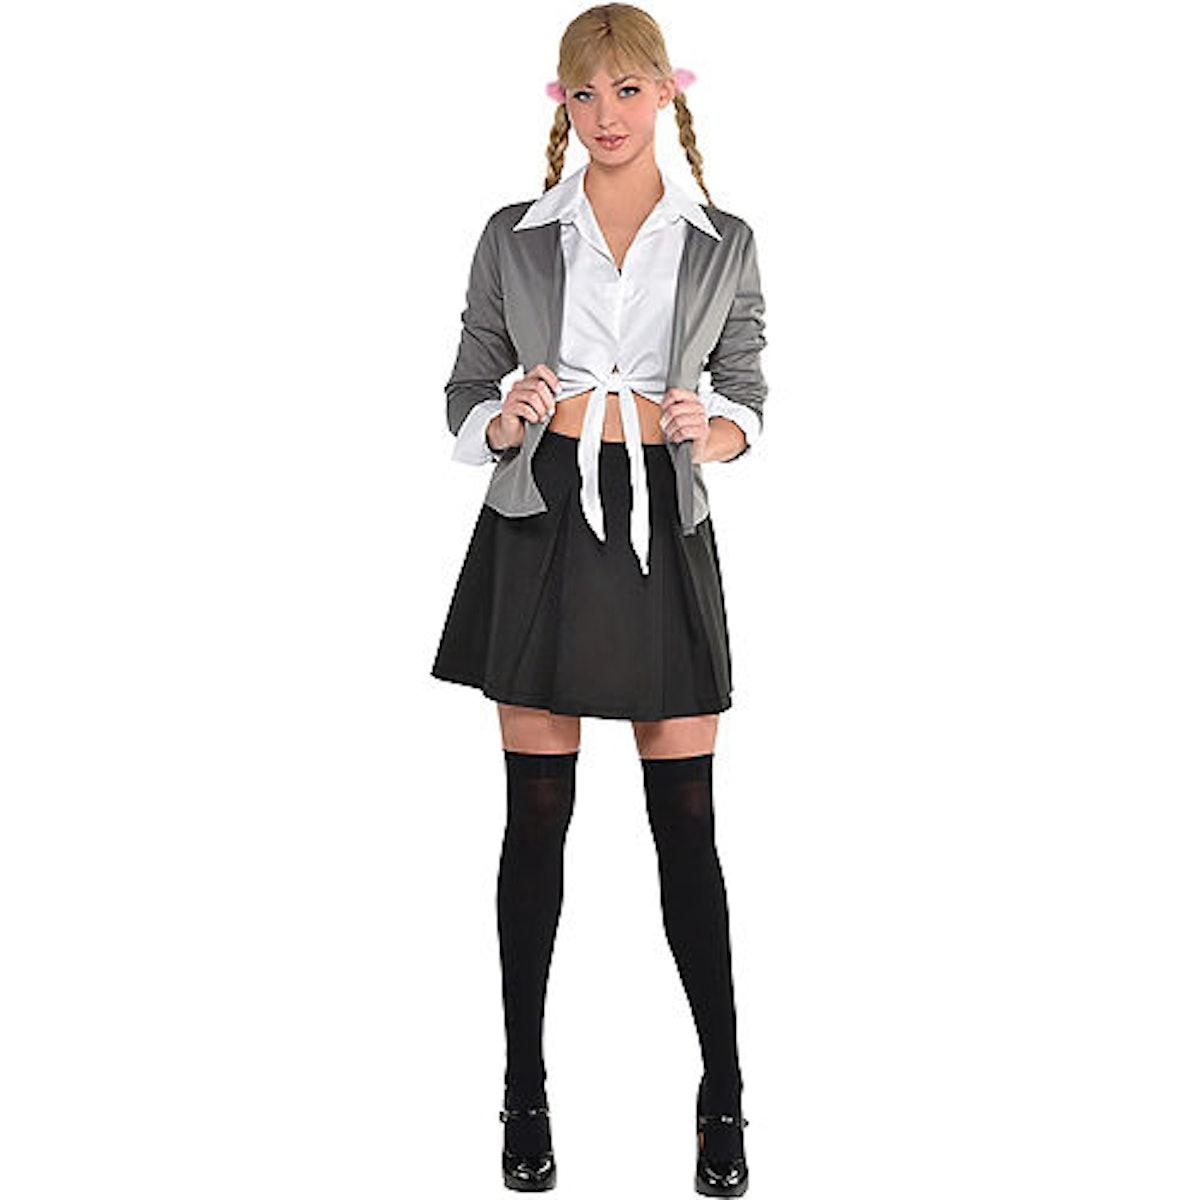 Adult 90's School Girl Costume Accessory Kit